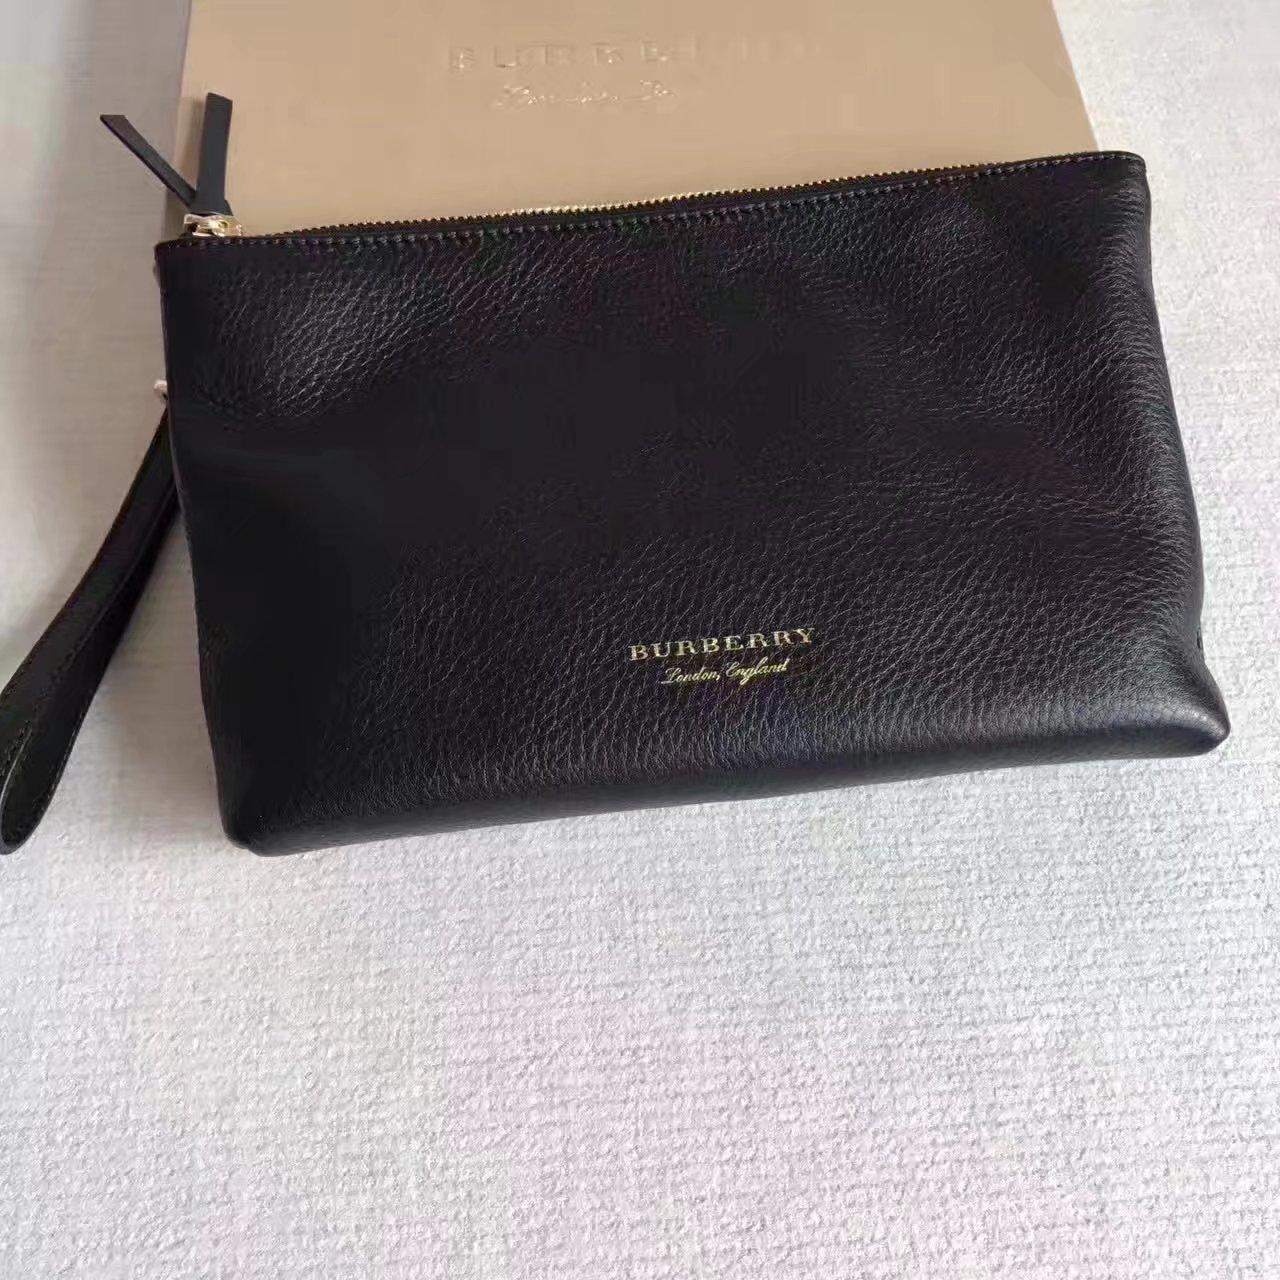 Burberry Women Leather Big Clutch Bag Chestnut Black